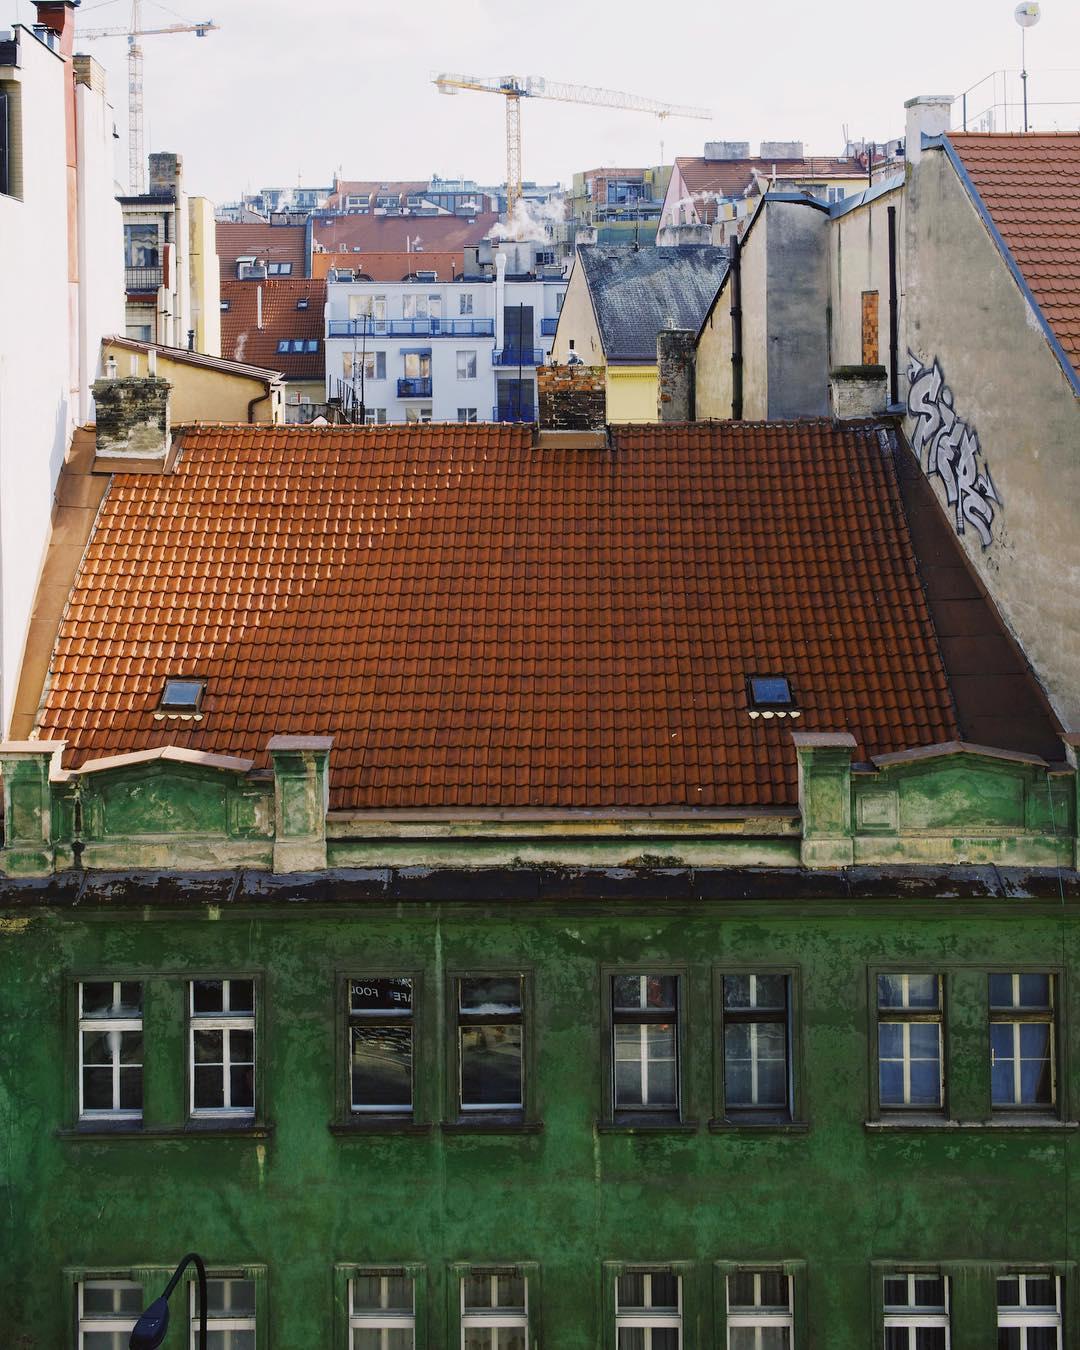 Polina-Shubkina-Prague-Photographer-003.jpeg